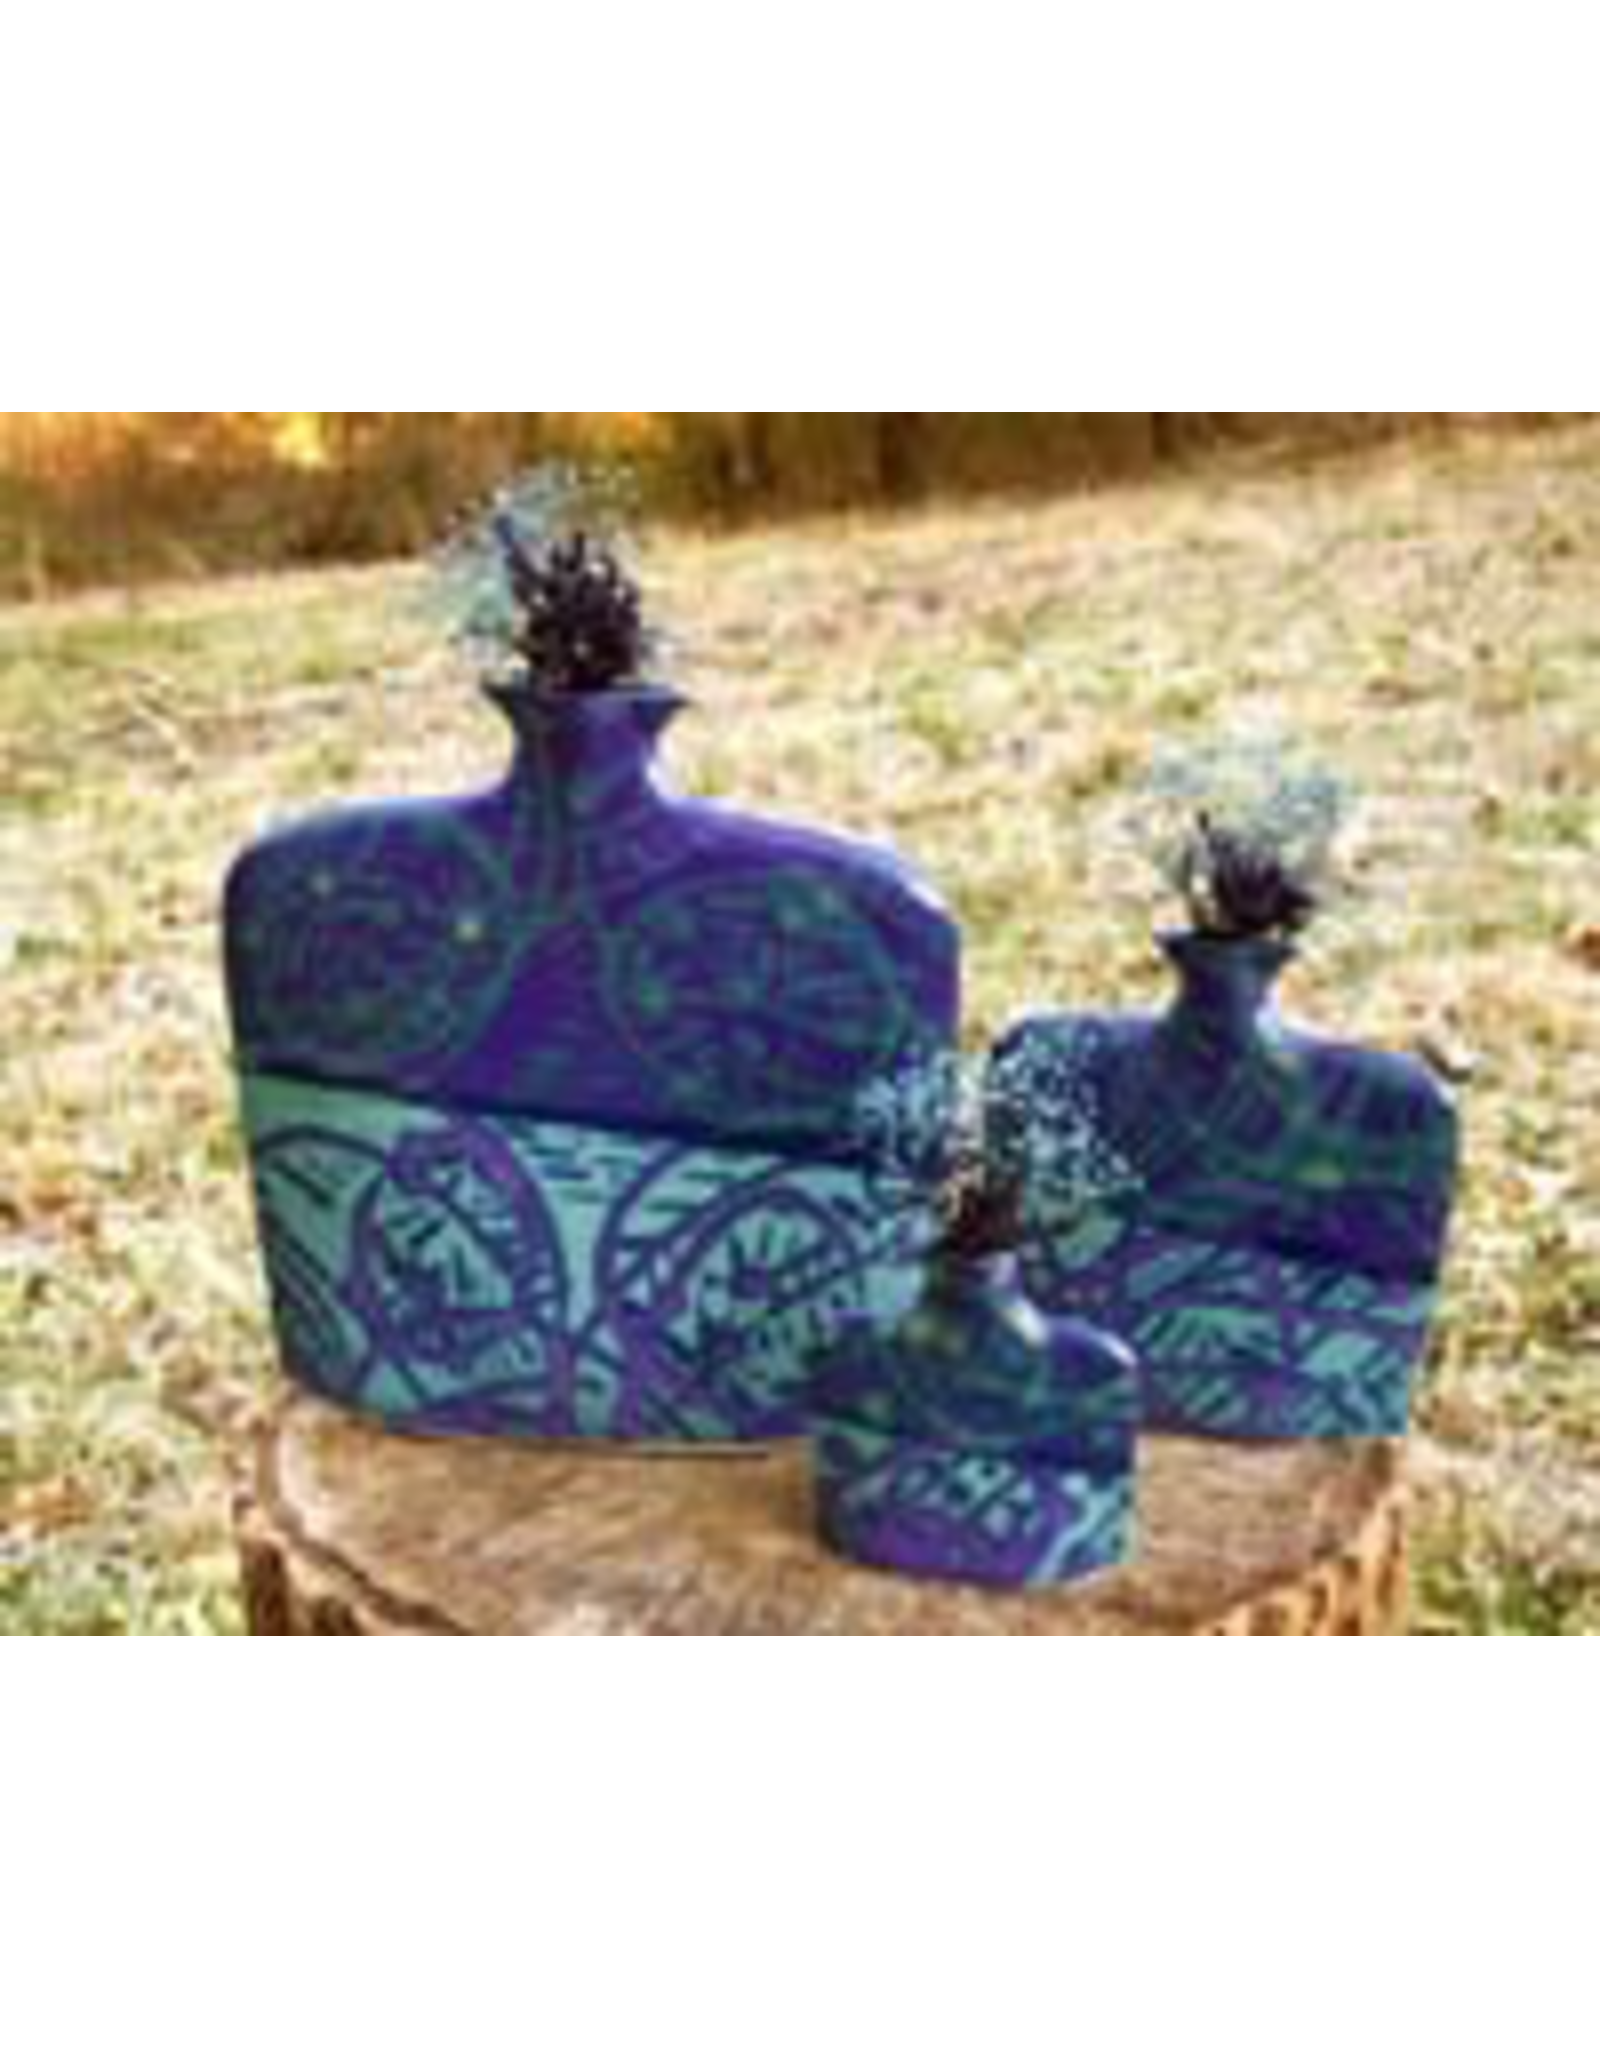 Earth & Sky Pottery Porcelain Slab Flower Vase (Lg, ESP)